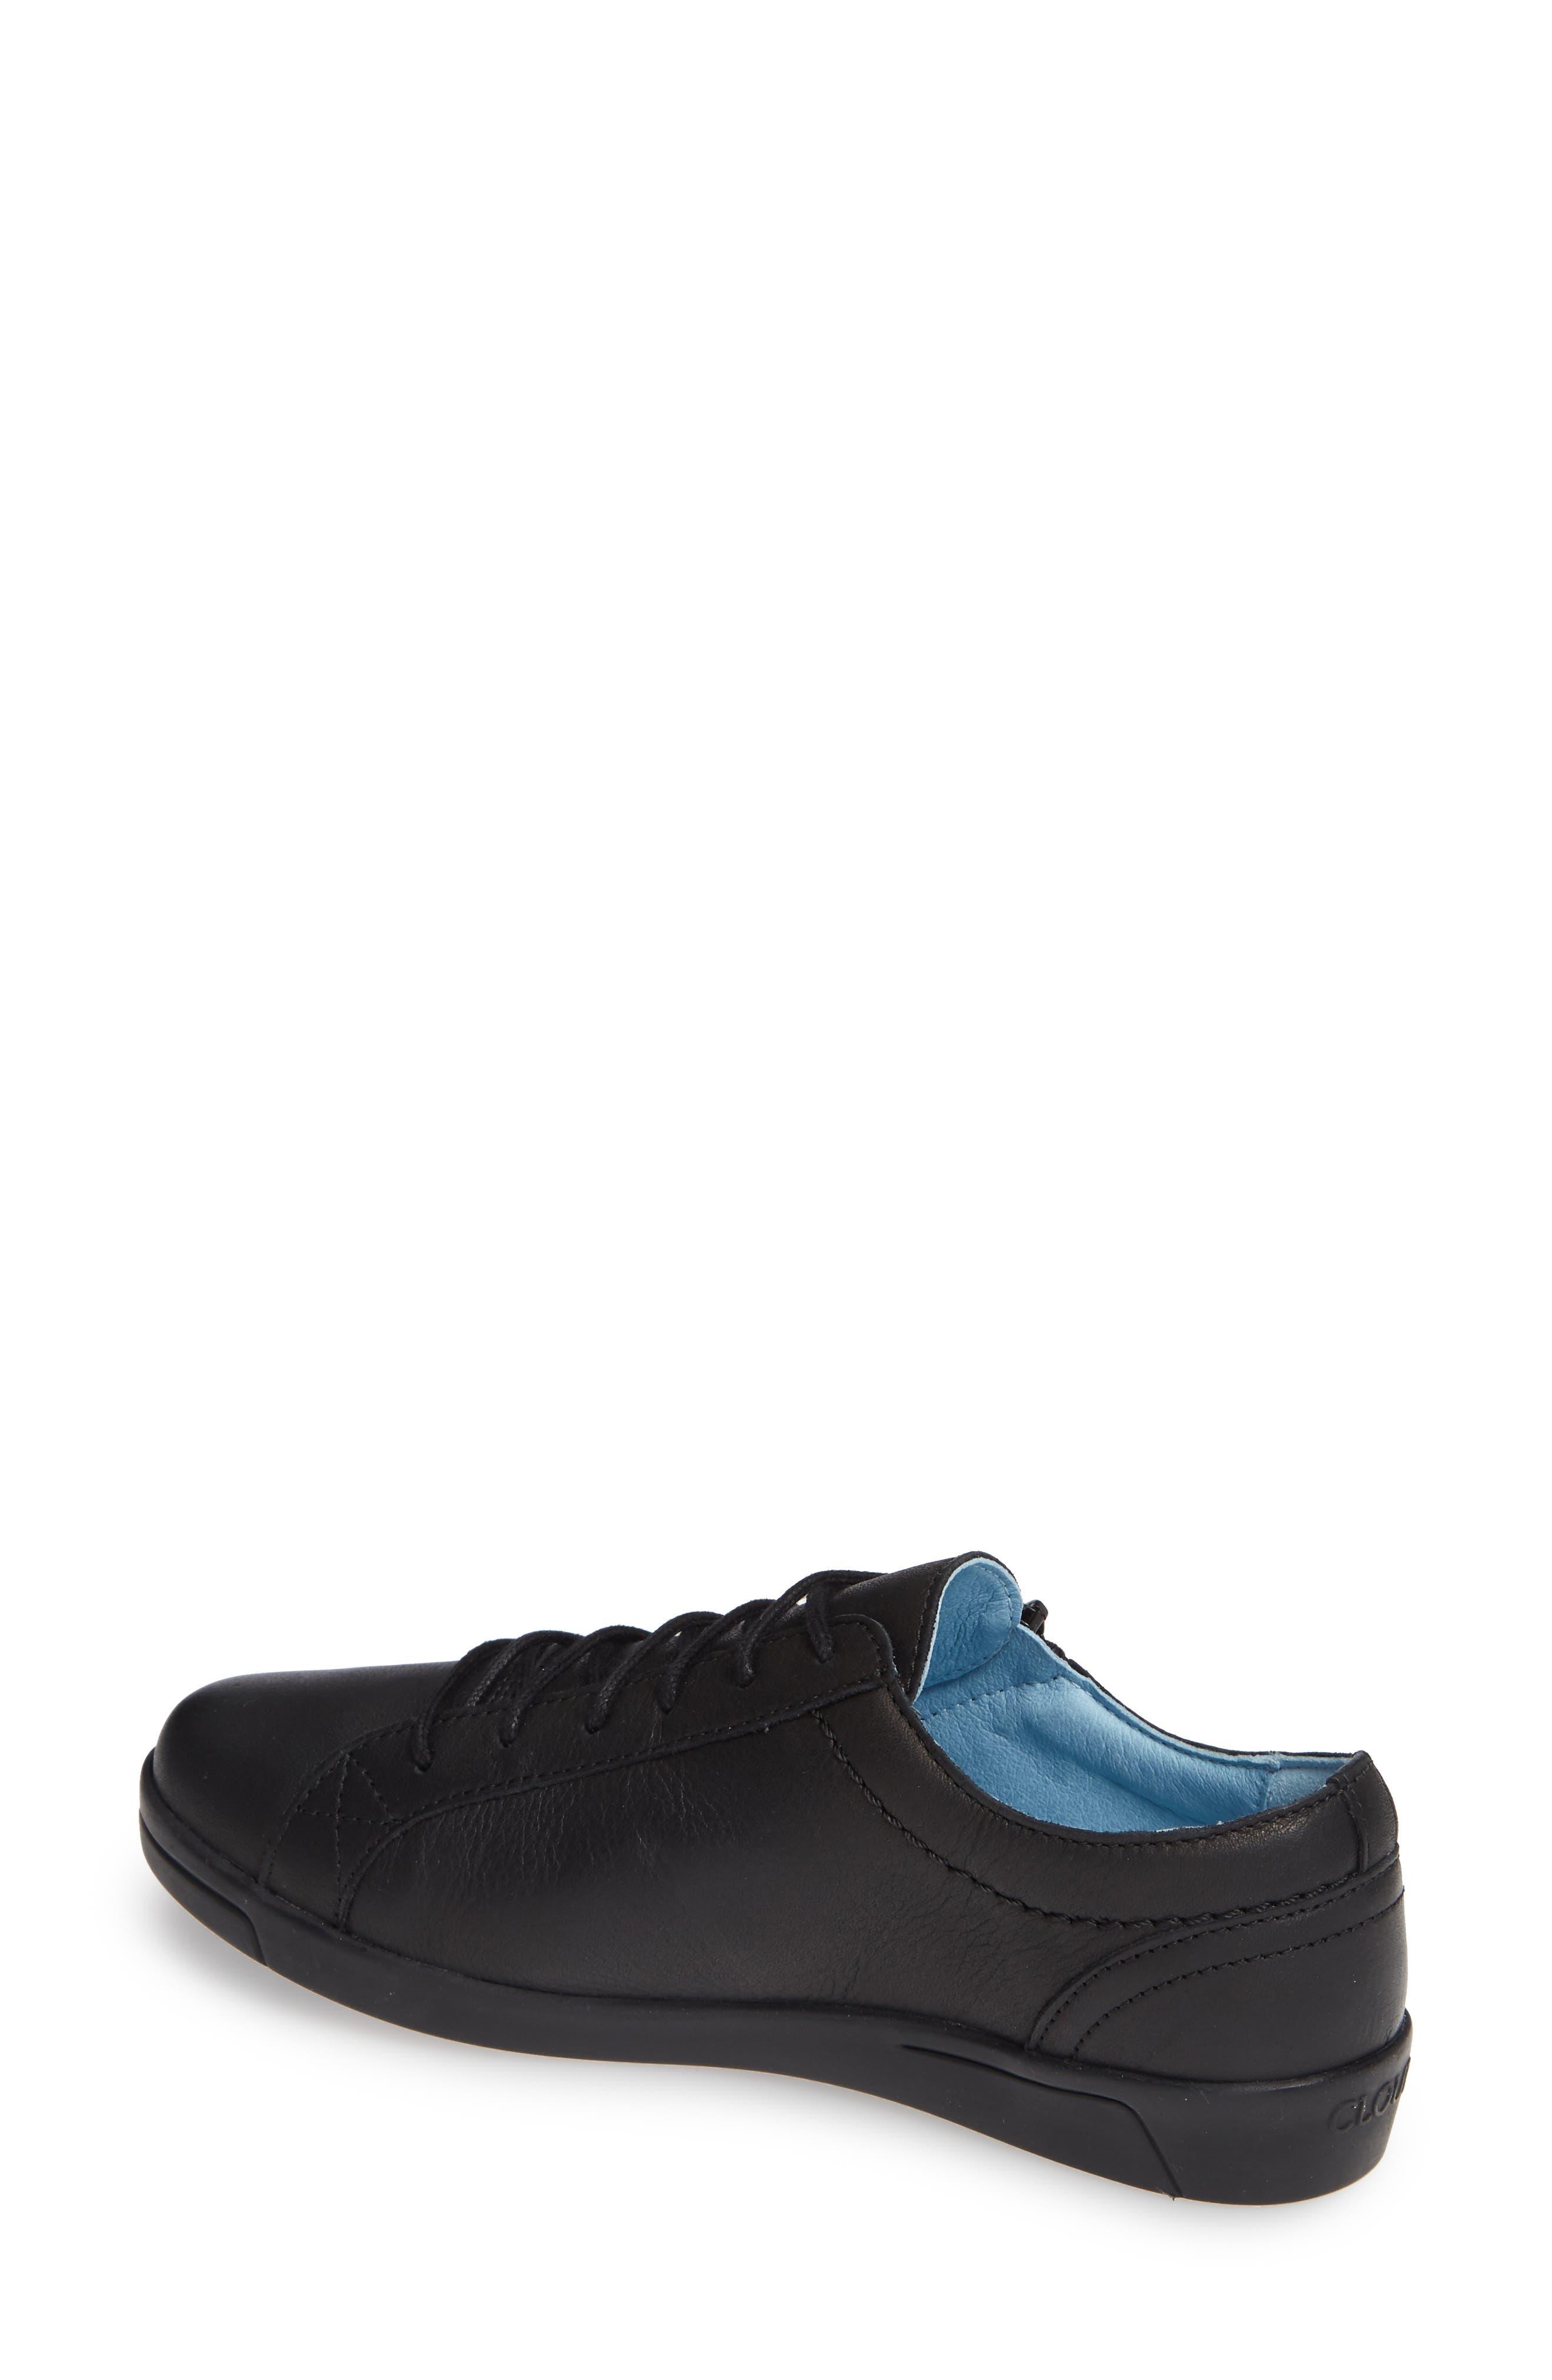 CLOUD, 'Aika' Leather Sneaker, Alternate thumbnail 2, color, 004